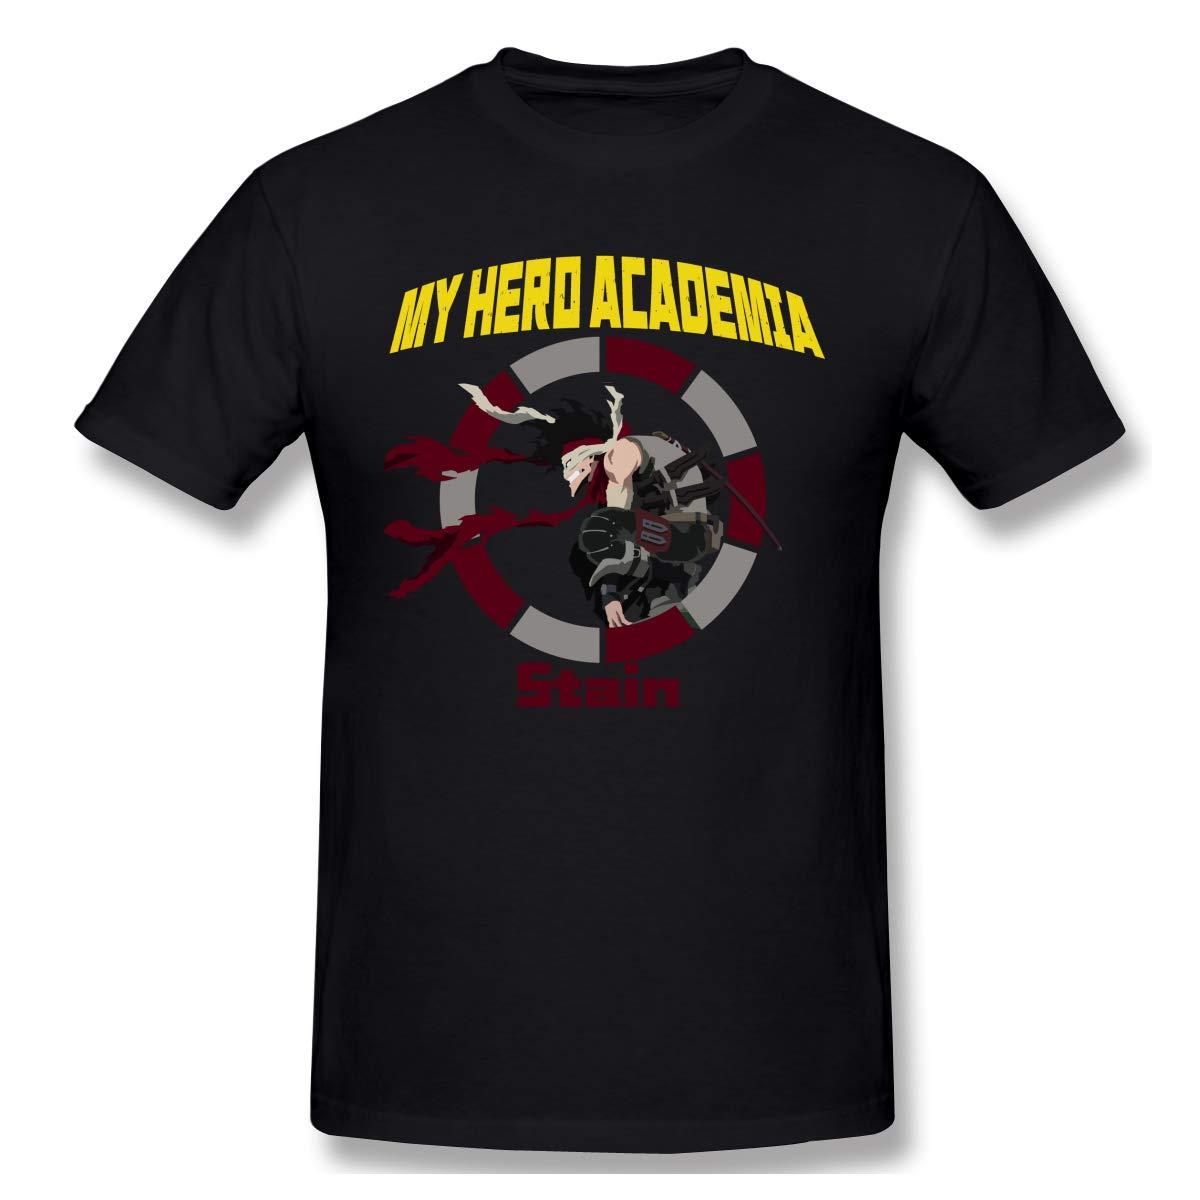 Crk008 T Shirt With My Hero Academia Anime Short Sleeve Stain Akaguro Chizome